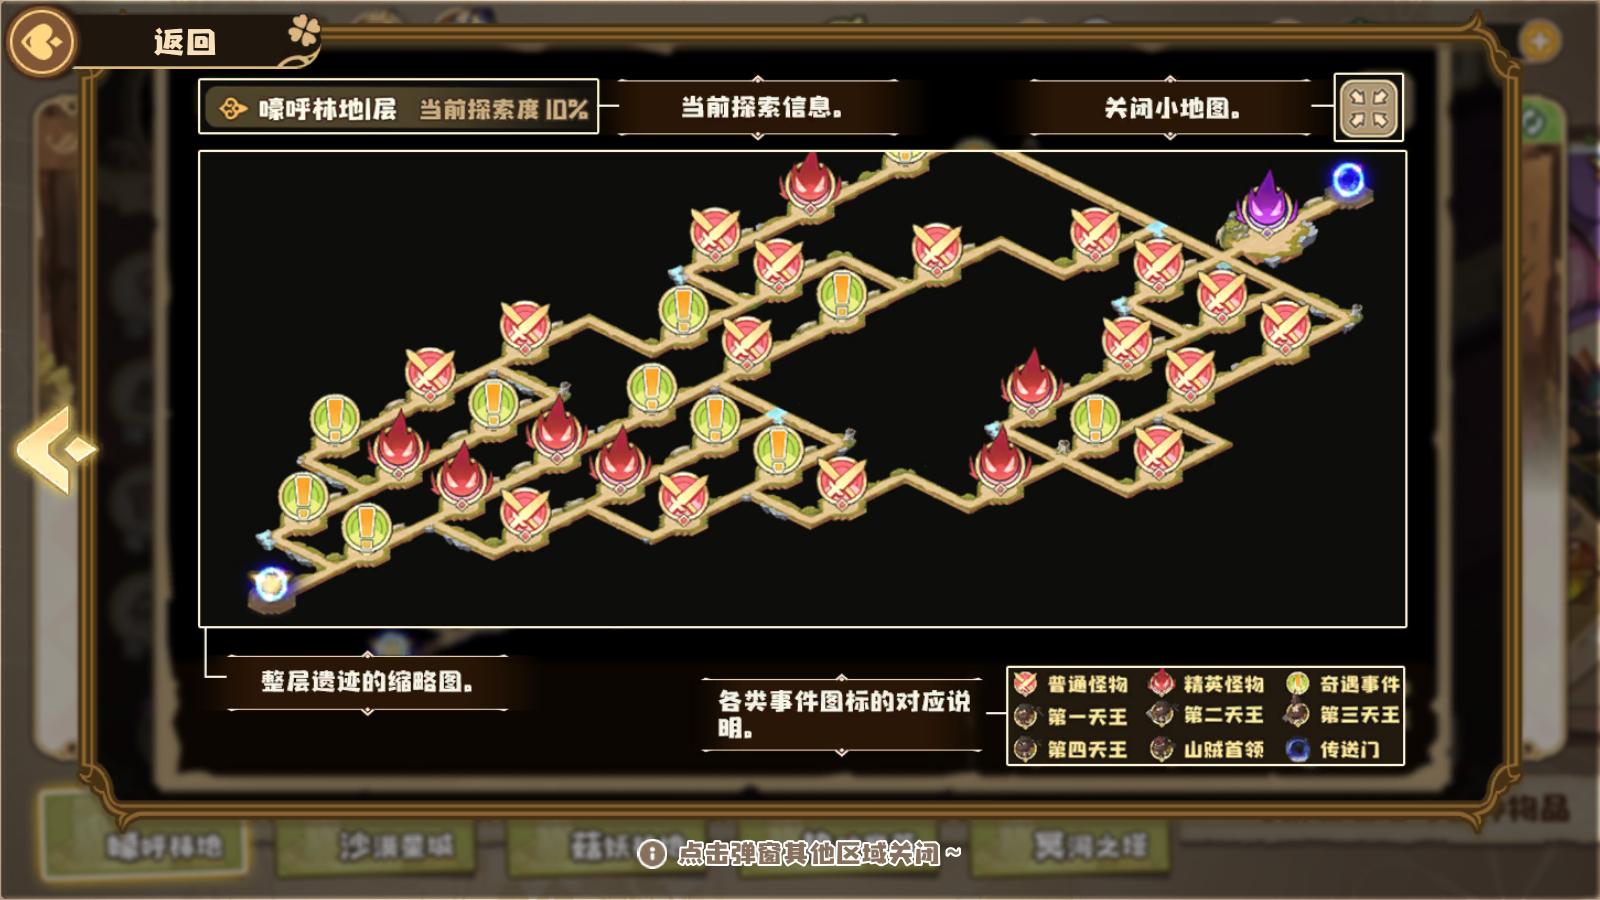 Screenshot 20210221-134131.png